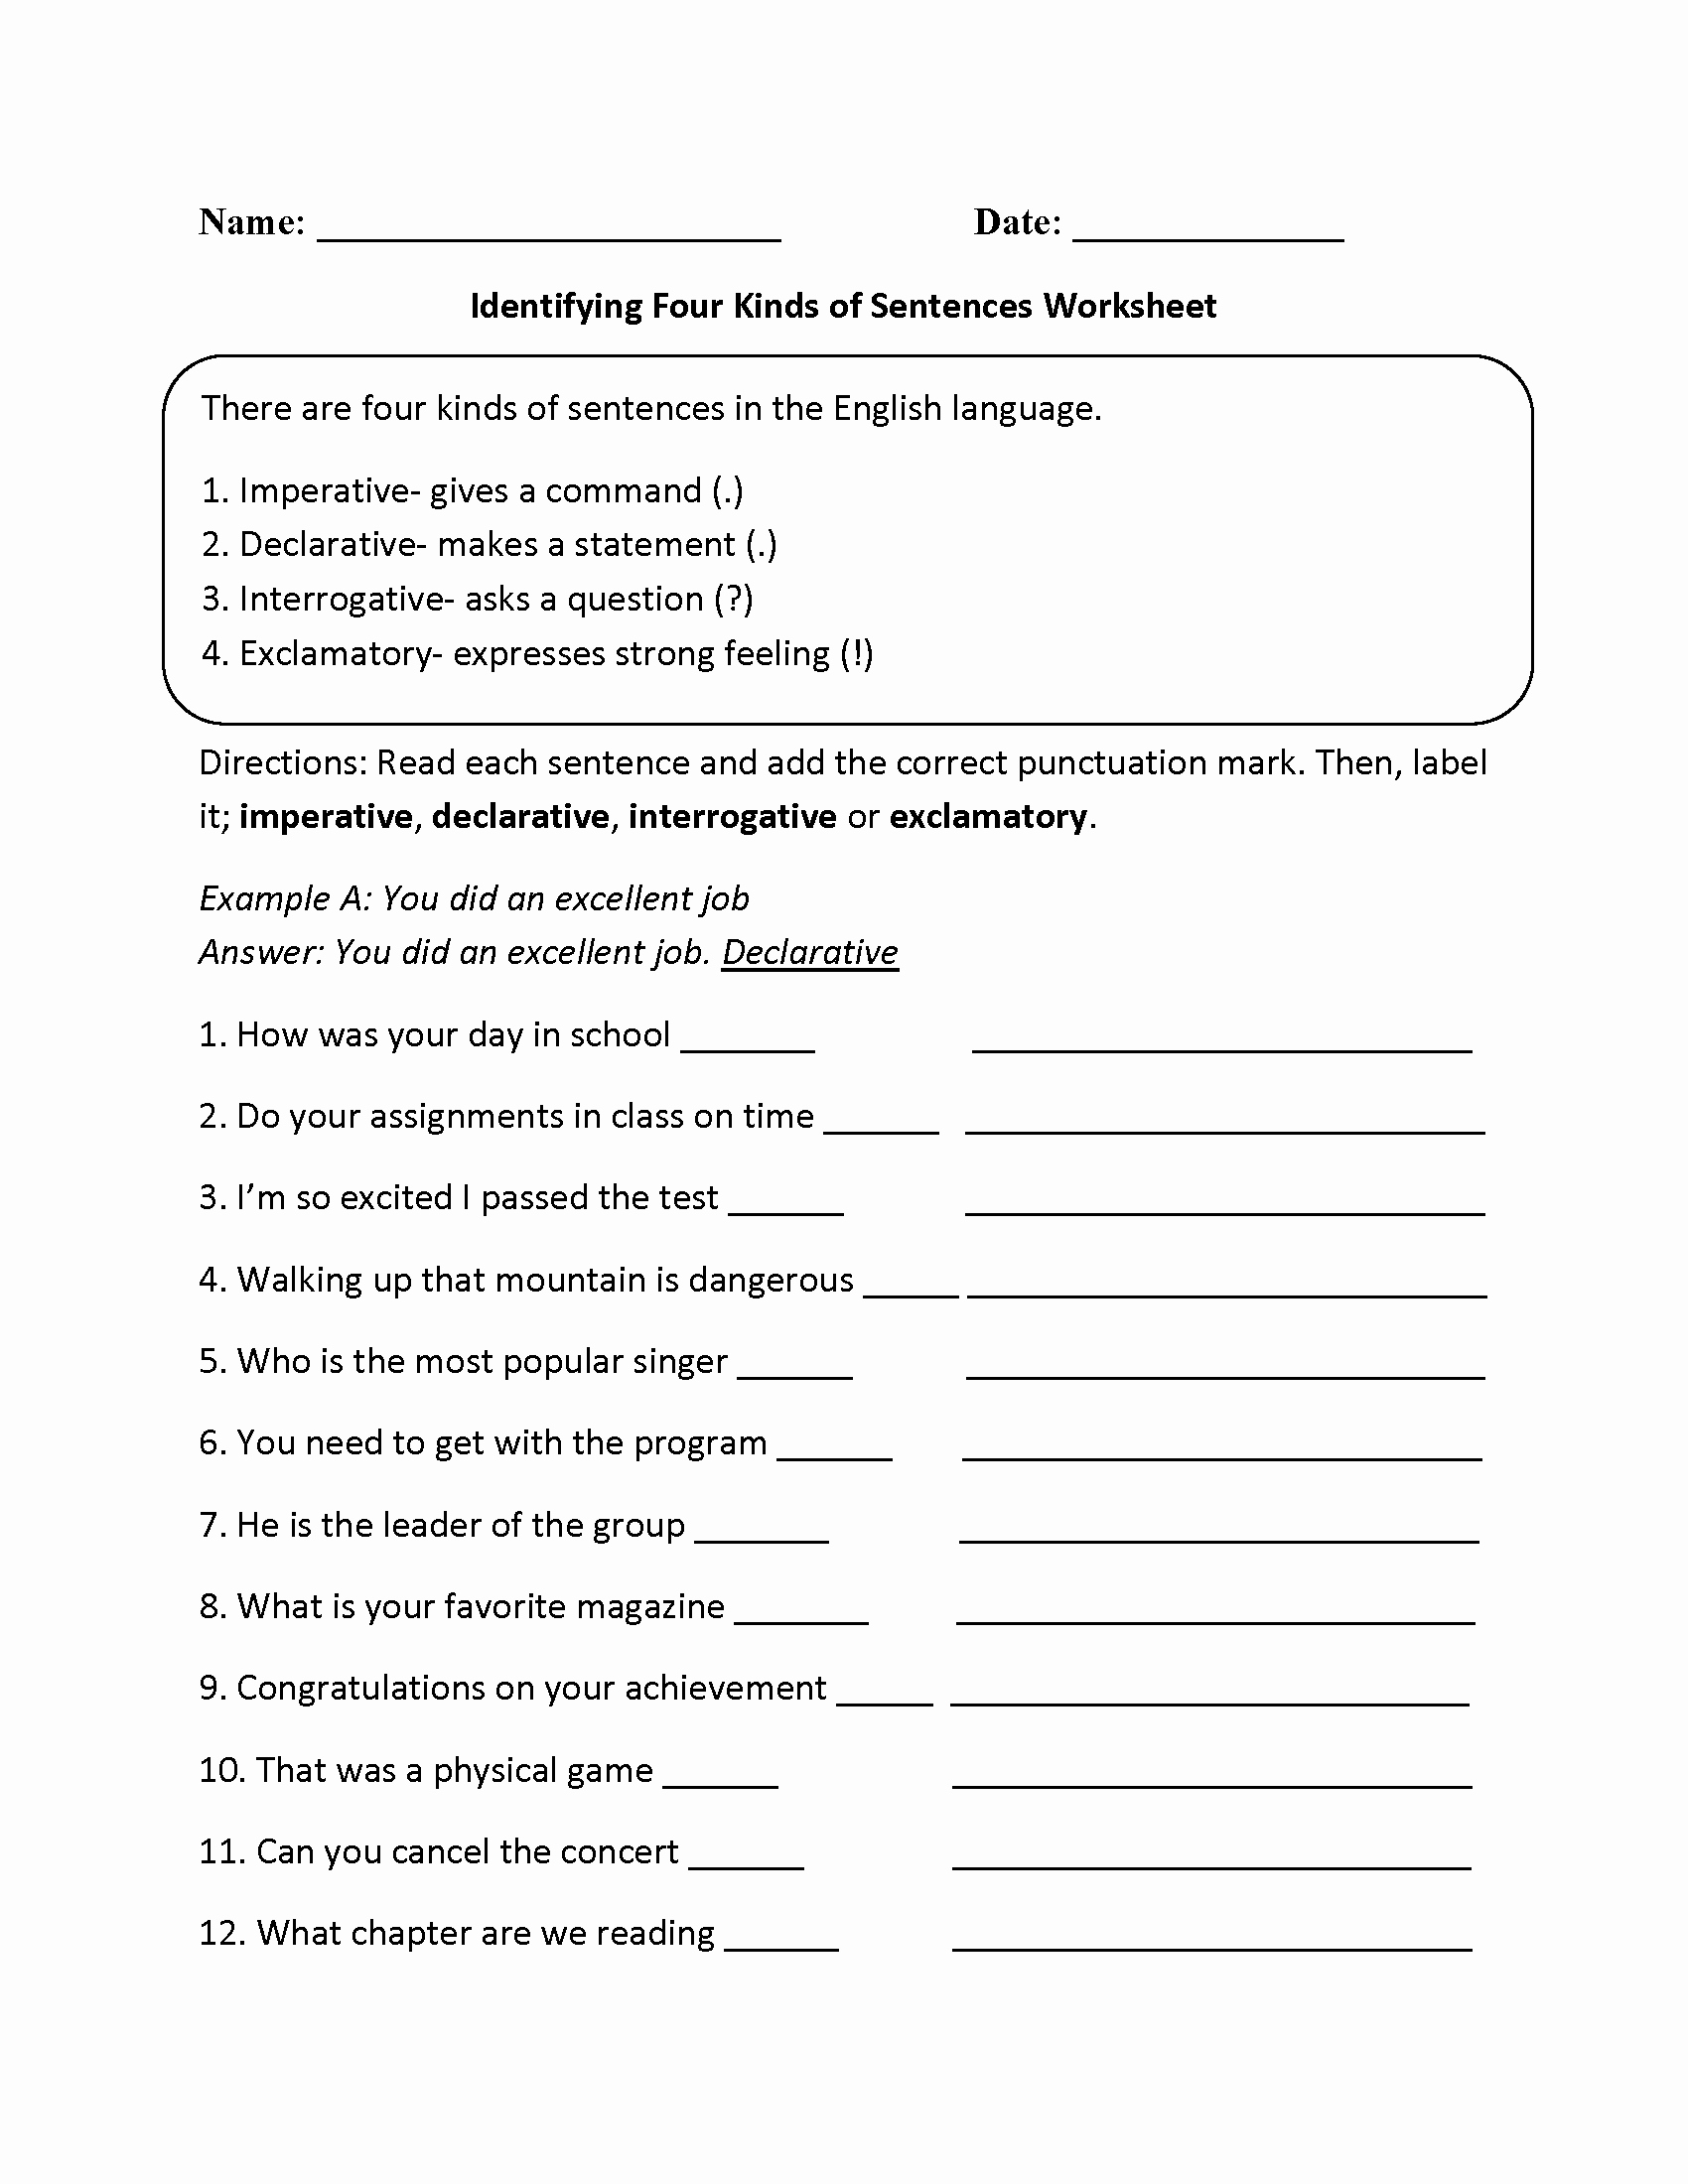 Four Types Of Sentences Worksheet New Practicing Four Kinds Of Sentences Worksheet